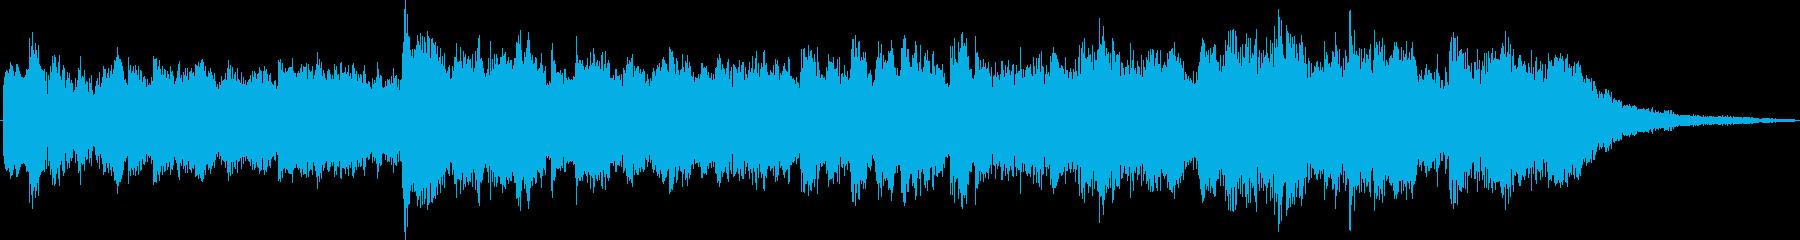 Pretty fantastic healing jingle's reproduced waveform